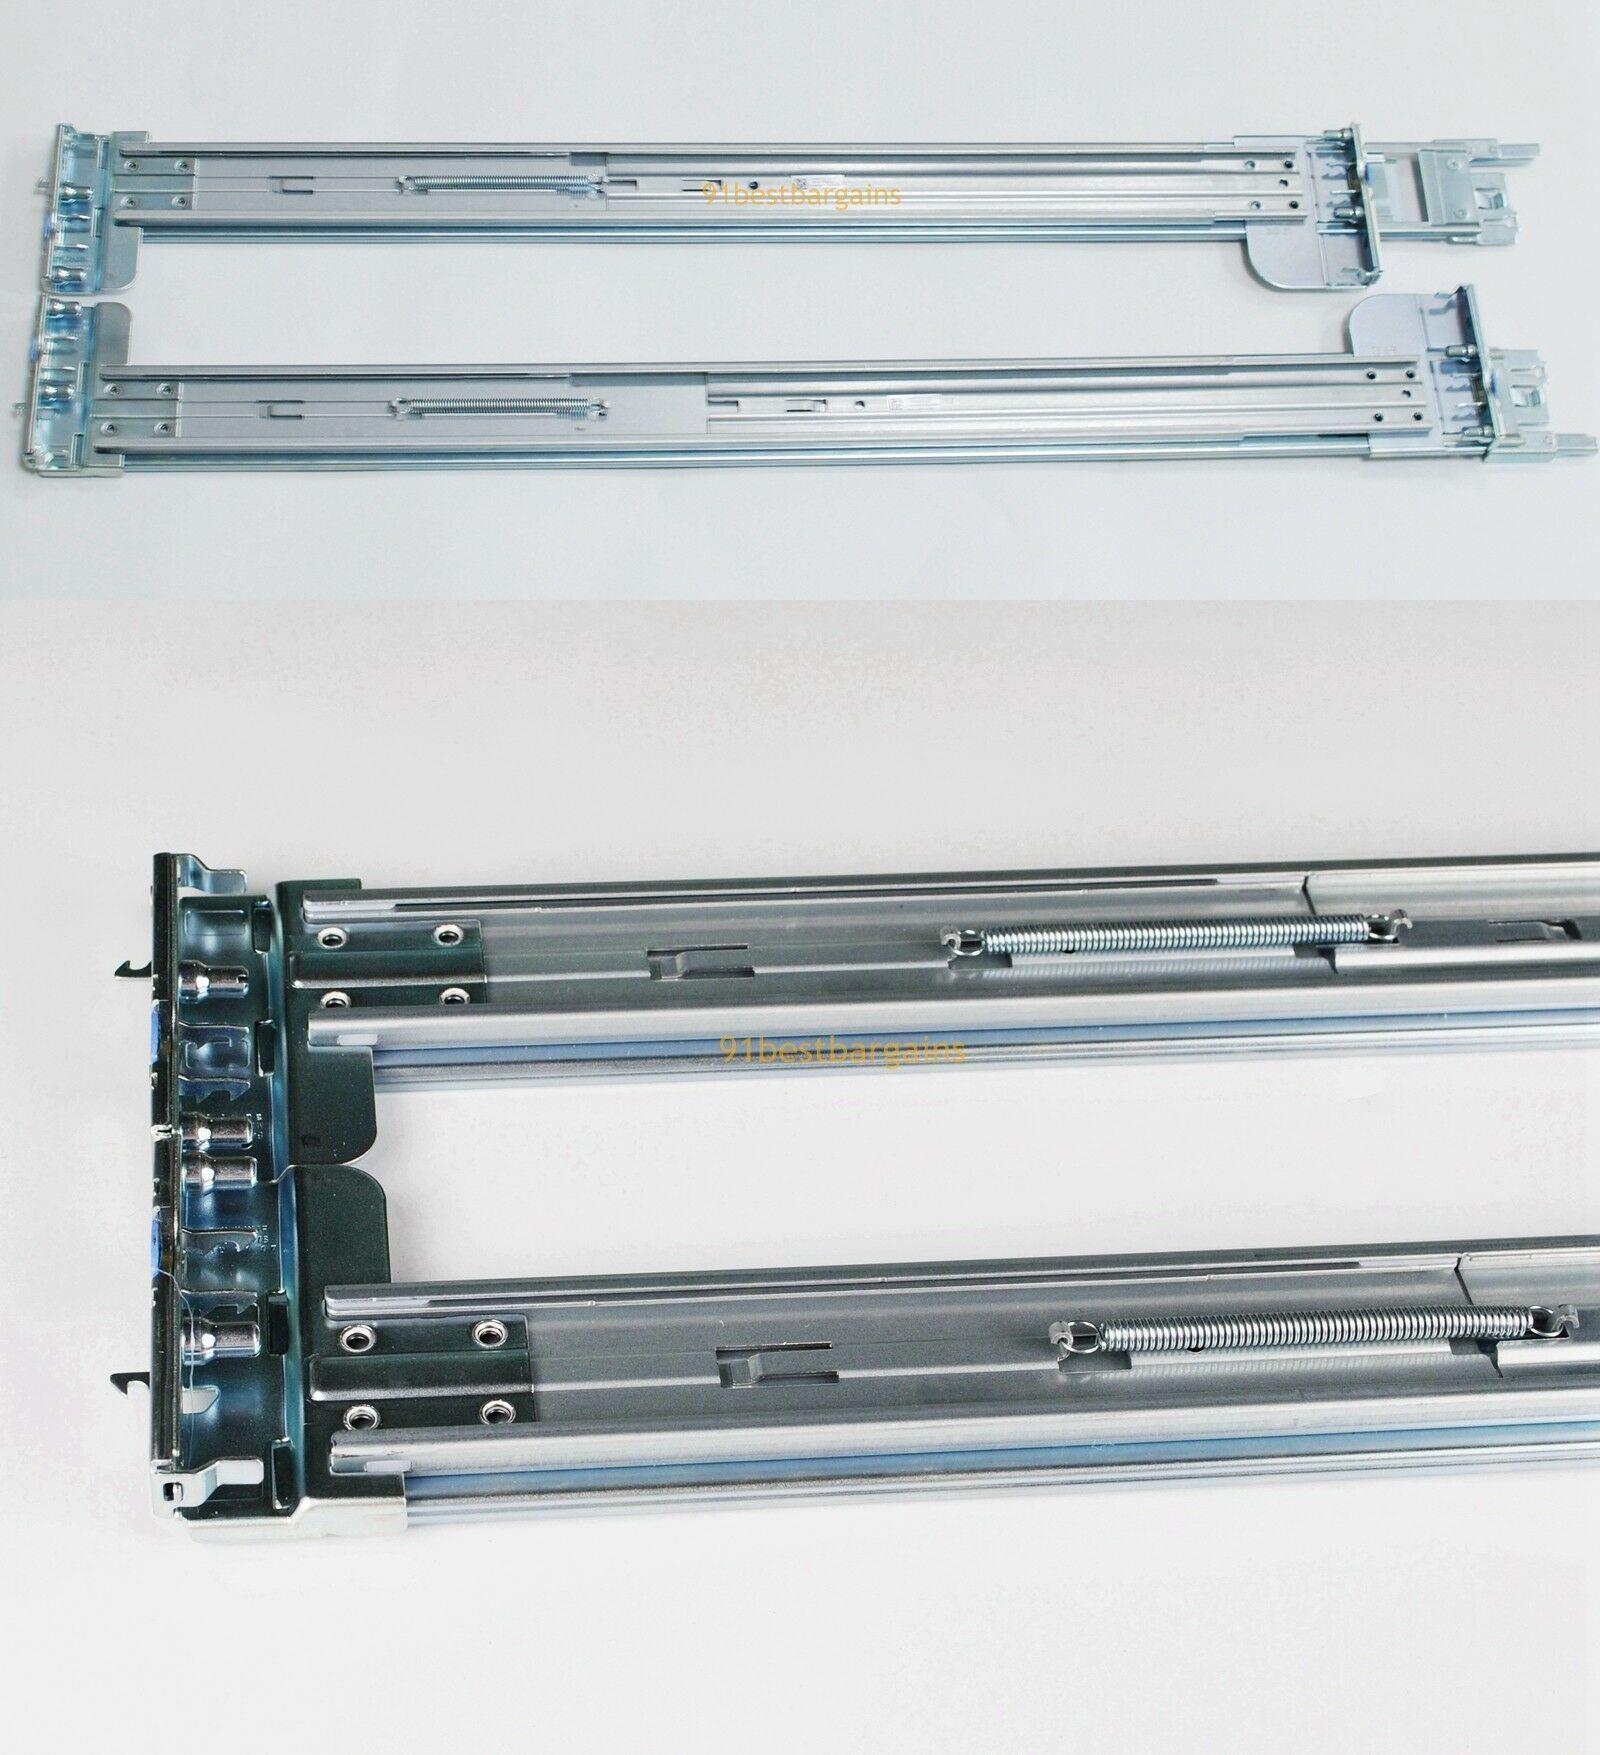 Dell R730 R720 R720XD 2U Sliding Ready Rail Kit 0PWN3 H4X6X XV104 US-SameDayShip